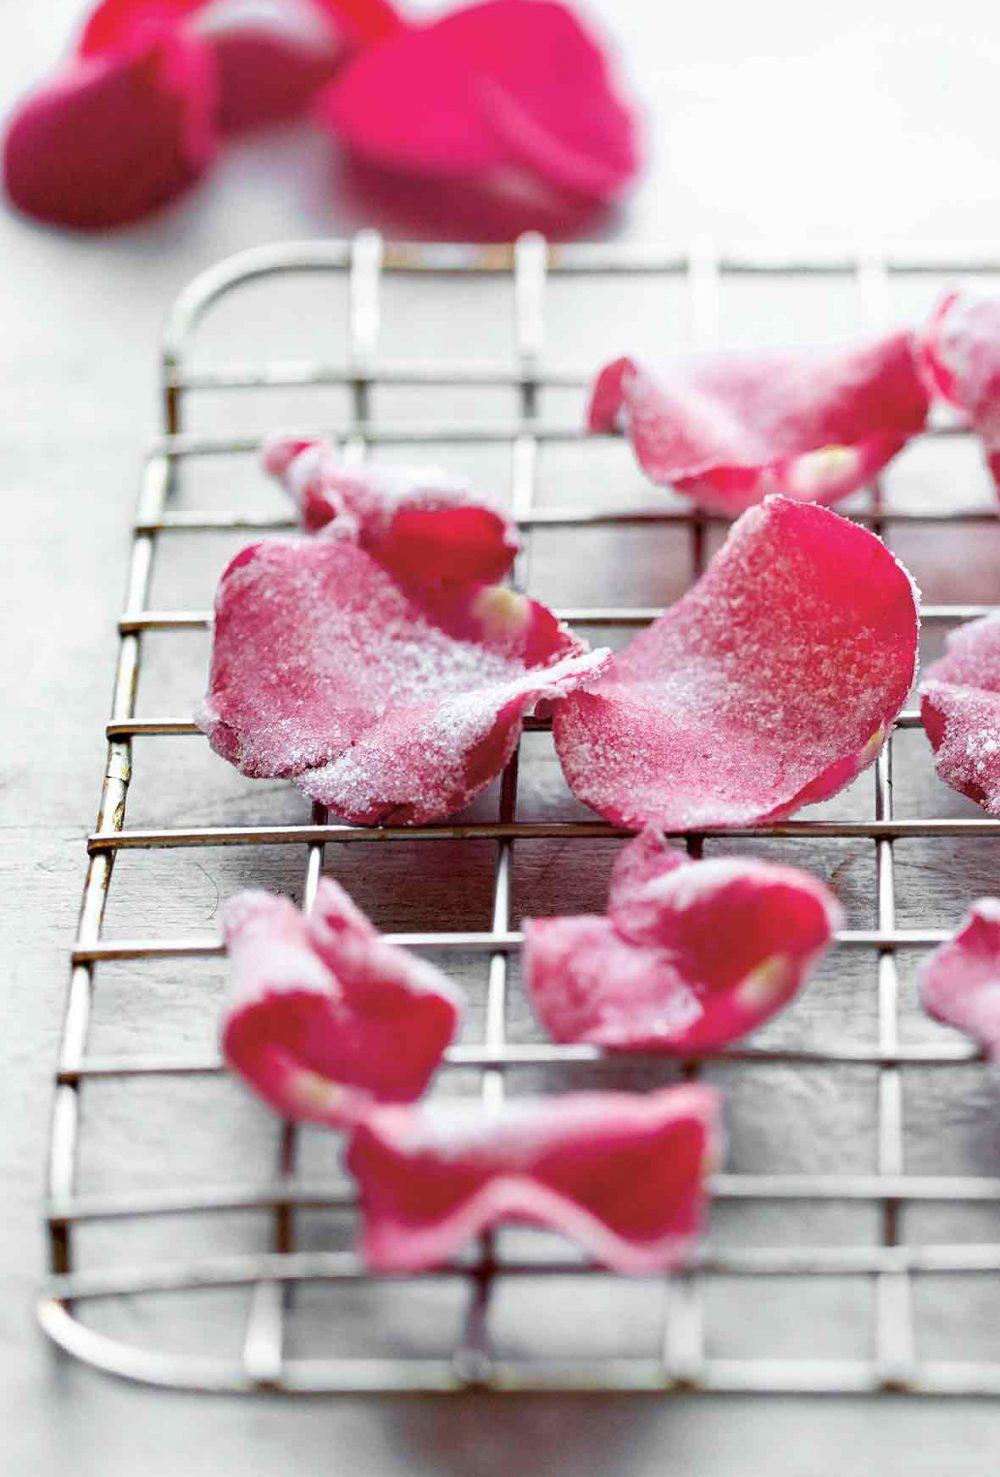 Candied Rose Petals - the Round Up of Rose Recipes via @PagingSupermom